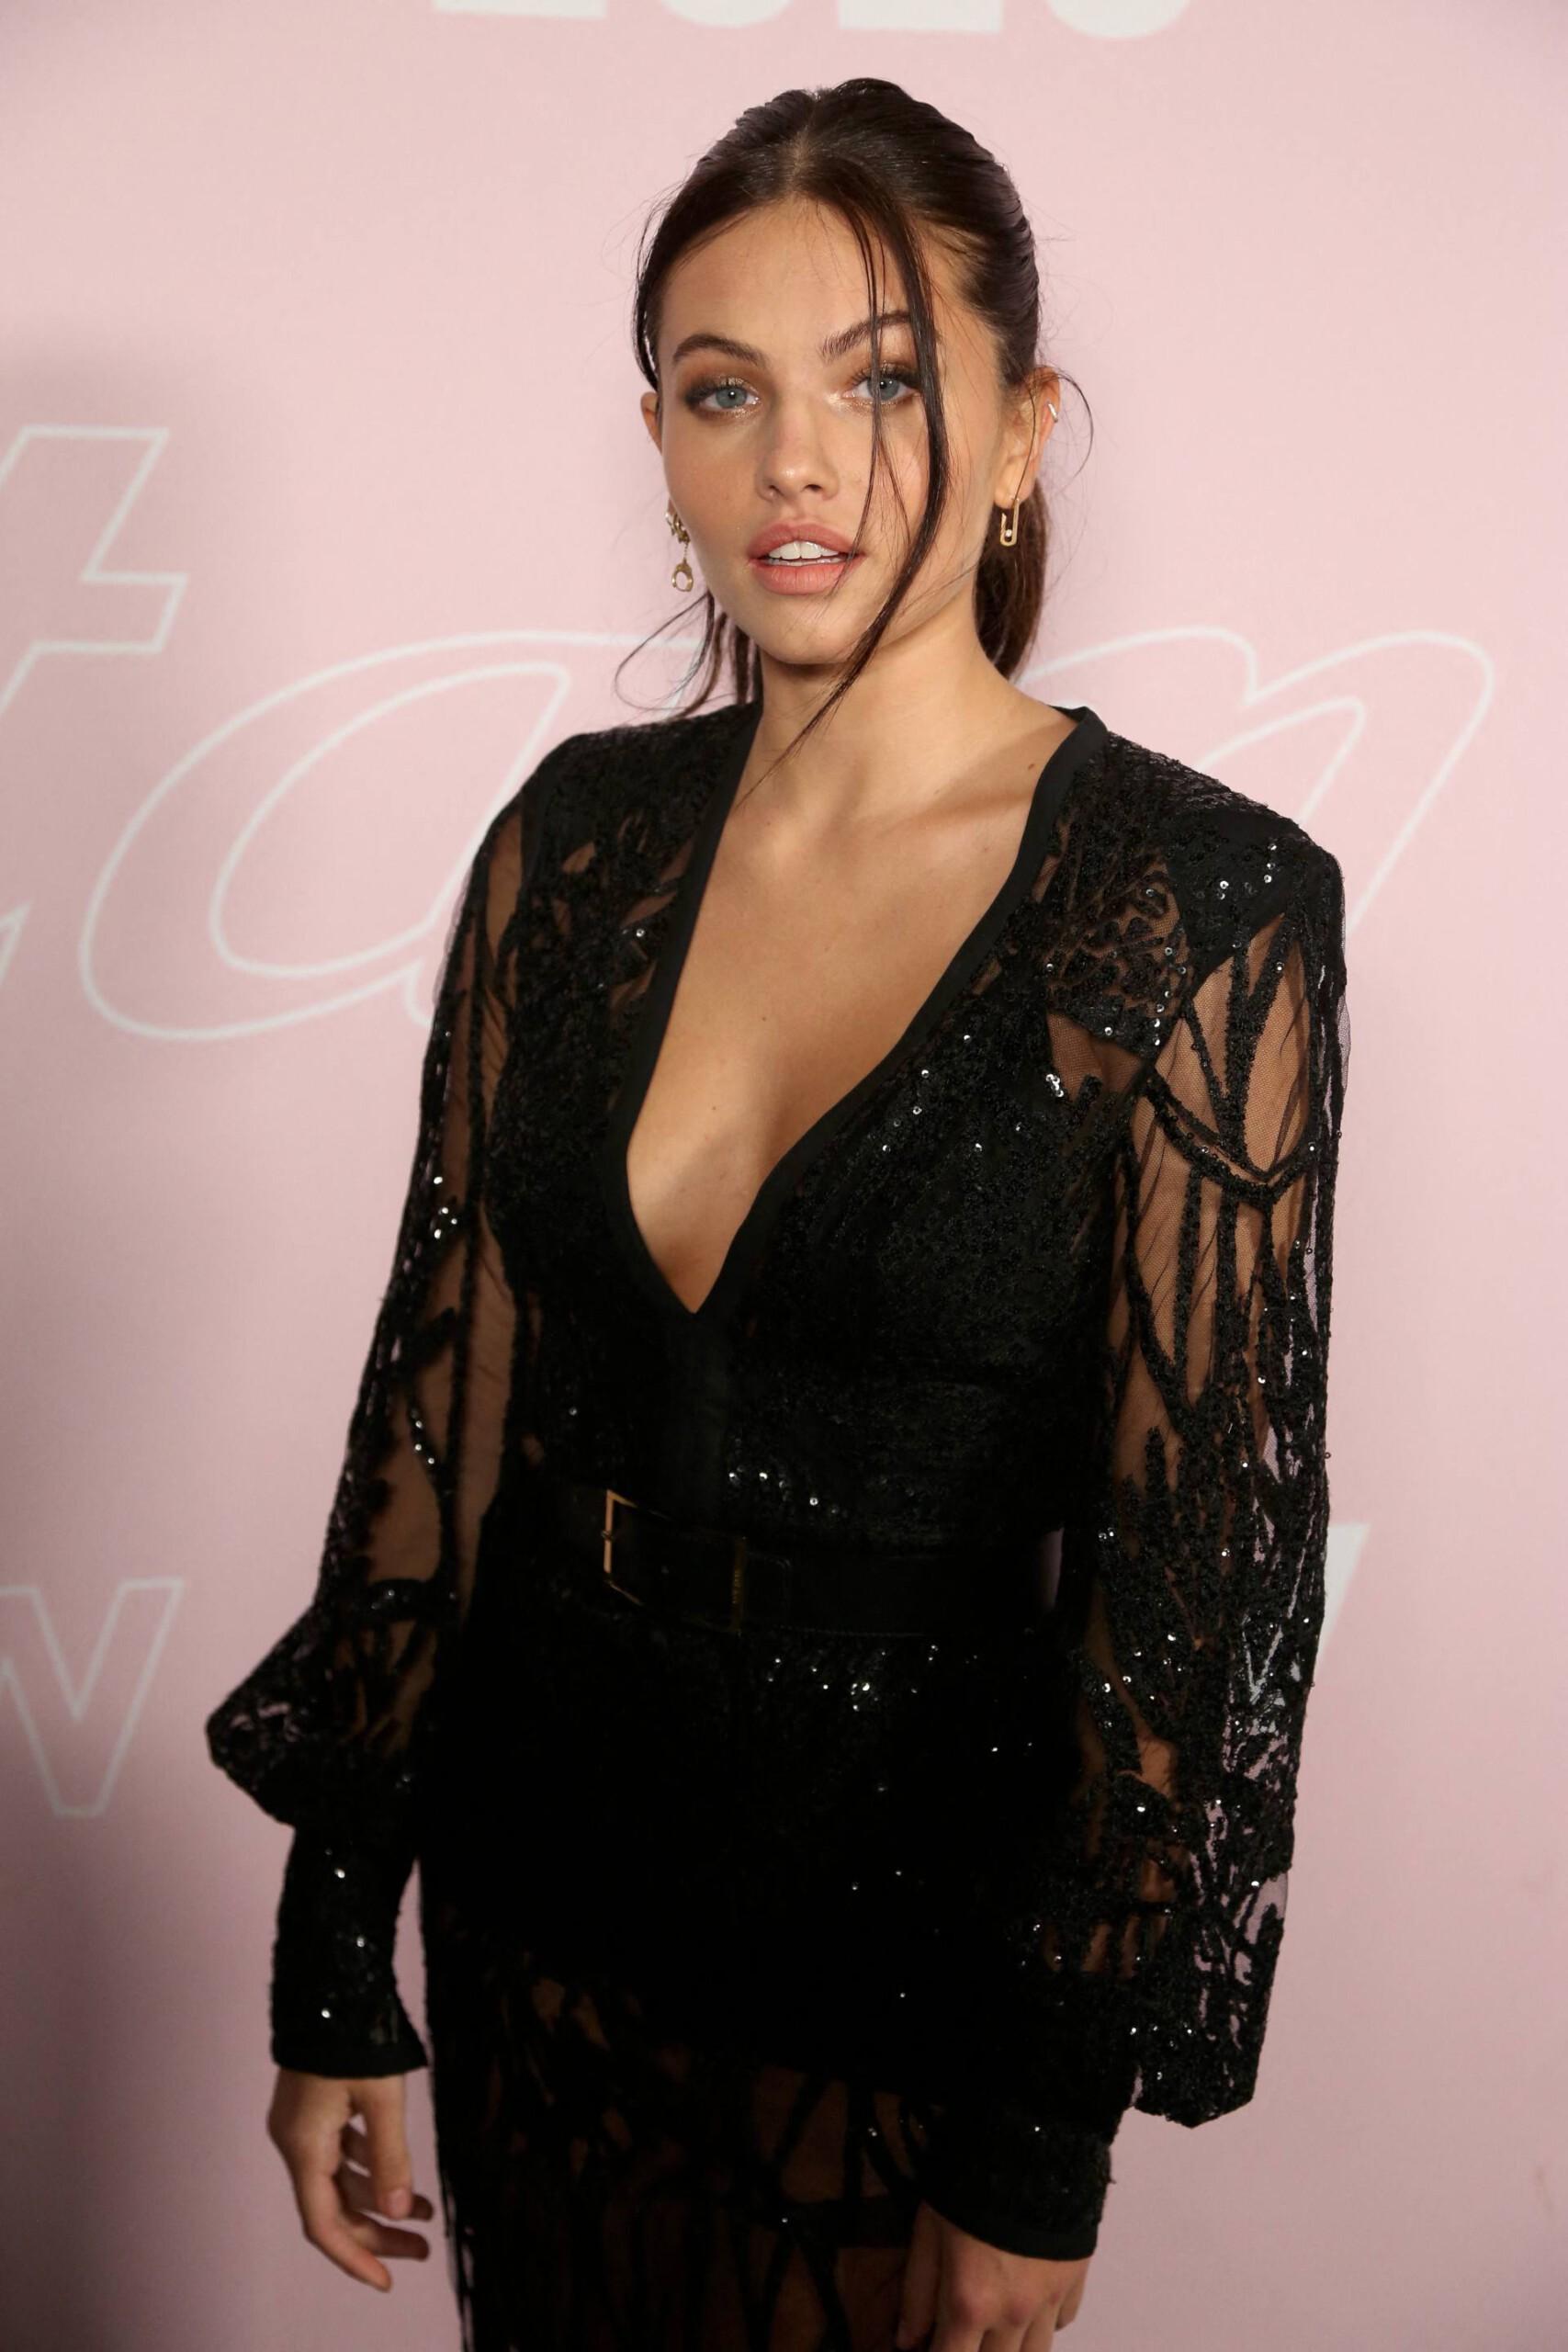 Thylane Blondeau - Sexy Body in Black Dress at Etam